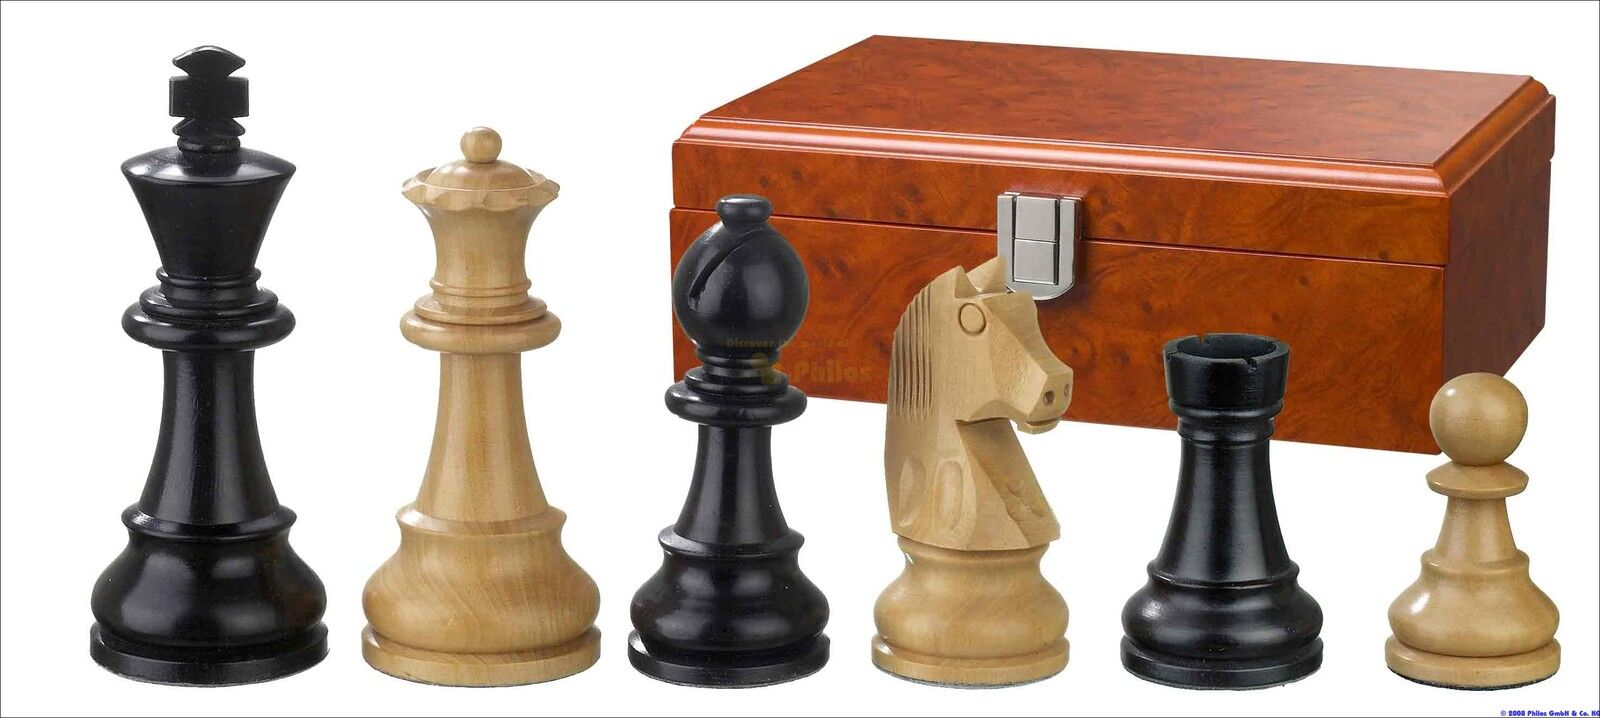 Schachfiguren Schachfiguren Schachfiguren KH 95 mm Staunton  Mod Ludwig XIV Philos 2125 589aea